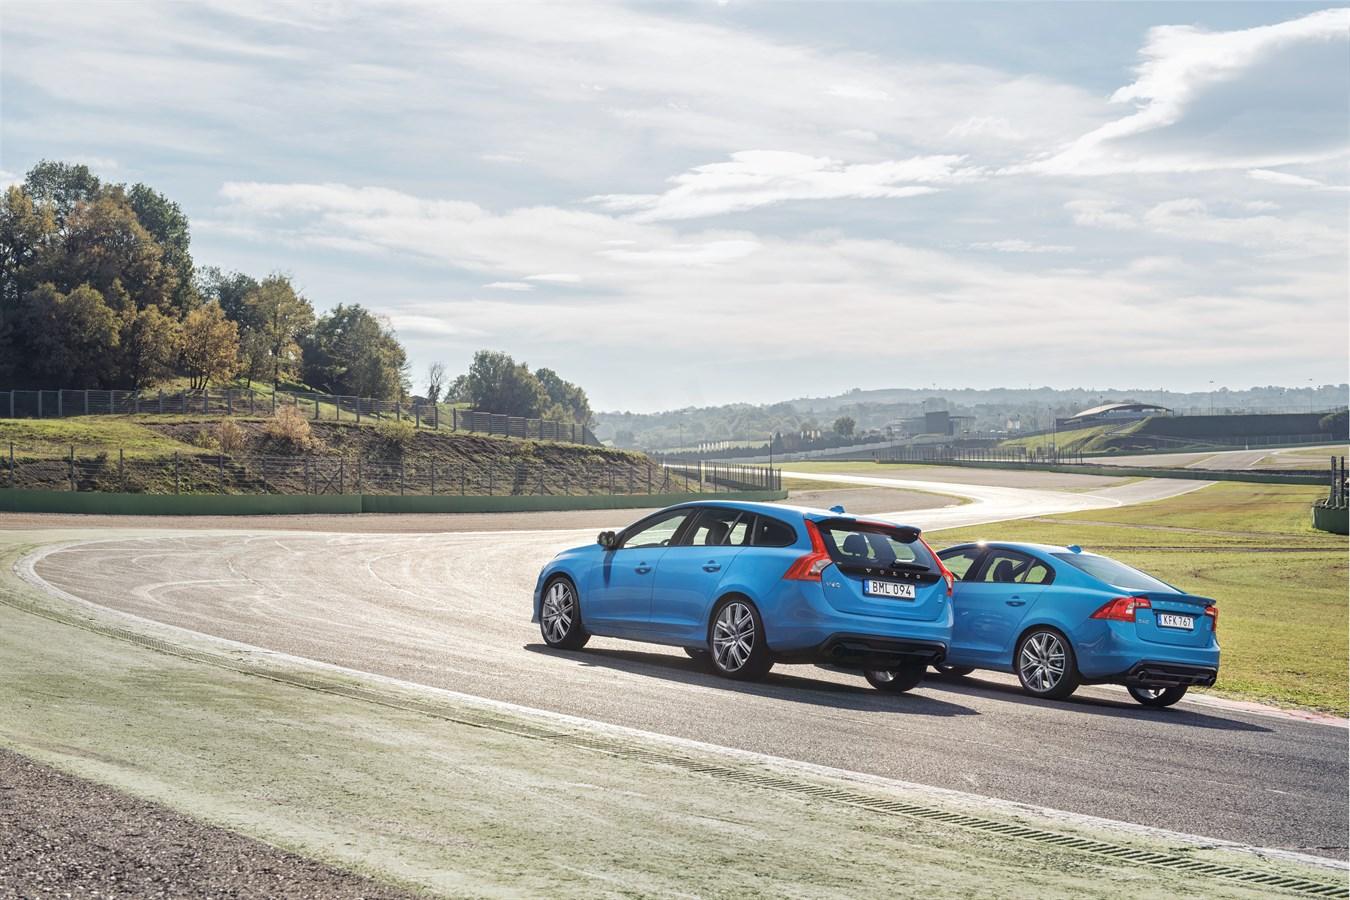 Volvo S60 and V60 Polestar location, static